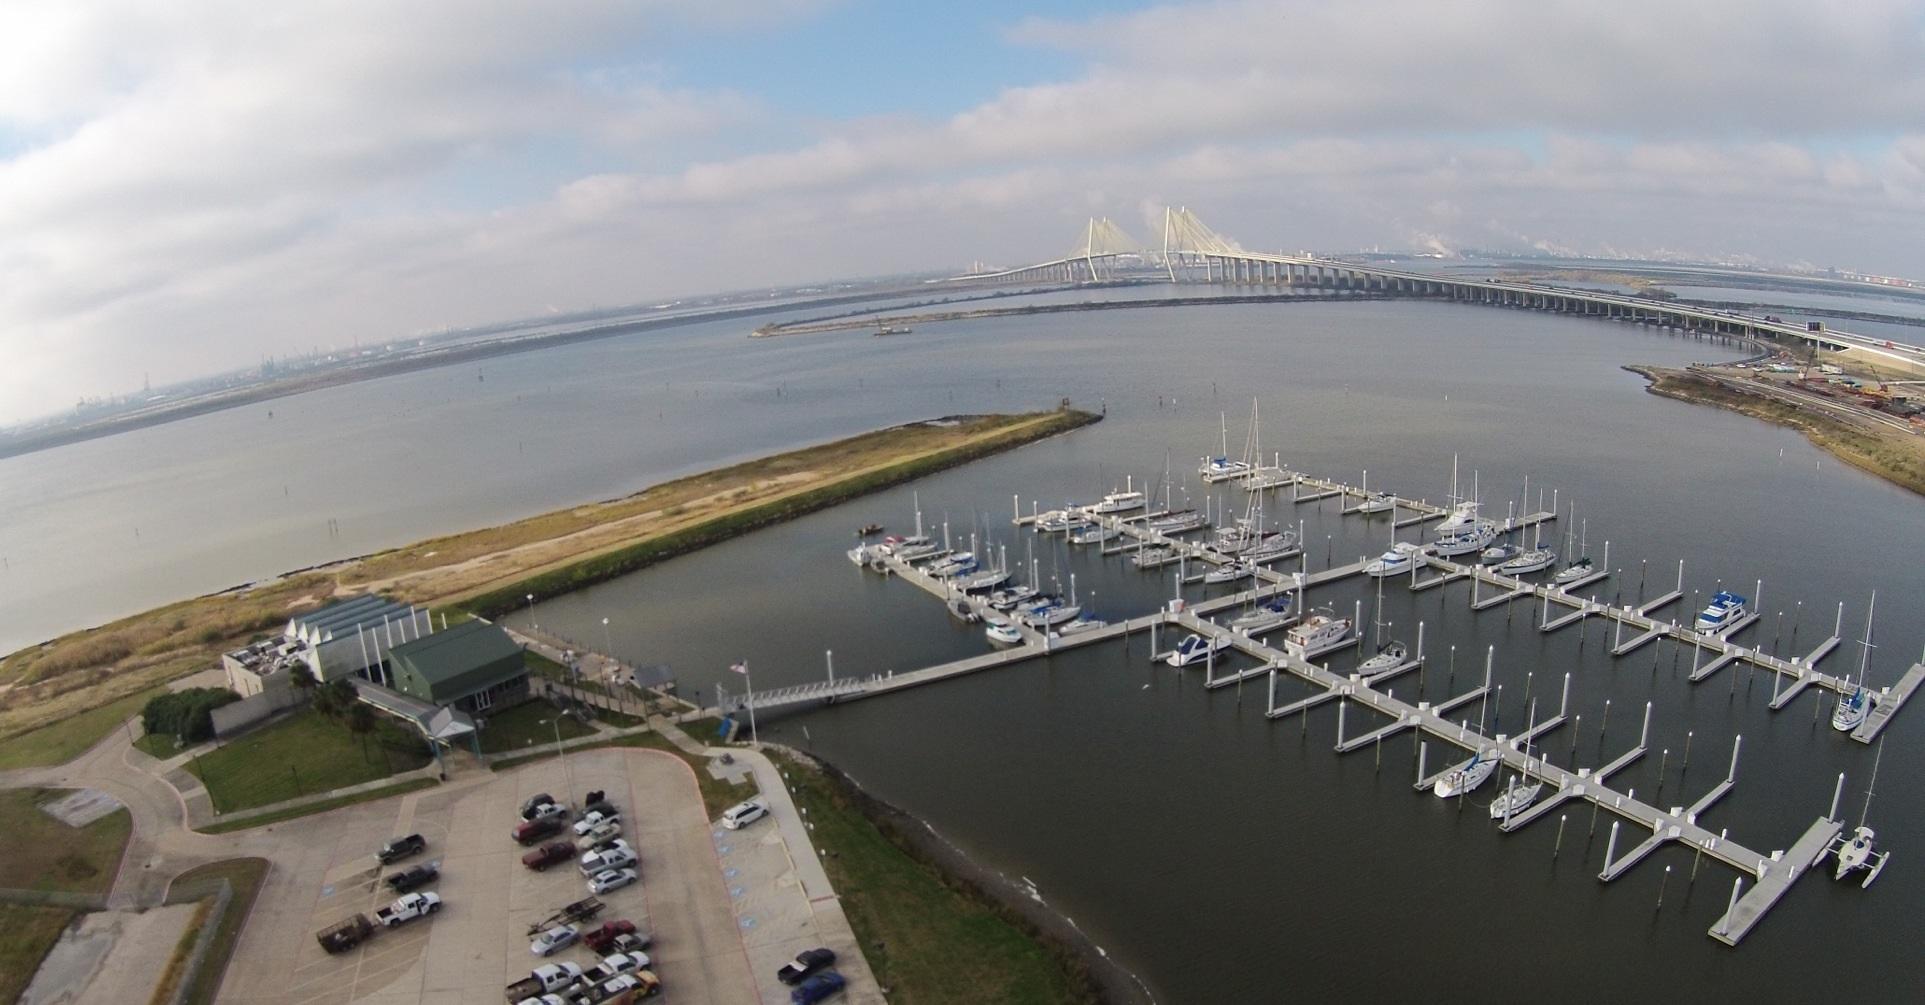 Bayland Marina in Baytown, TX